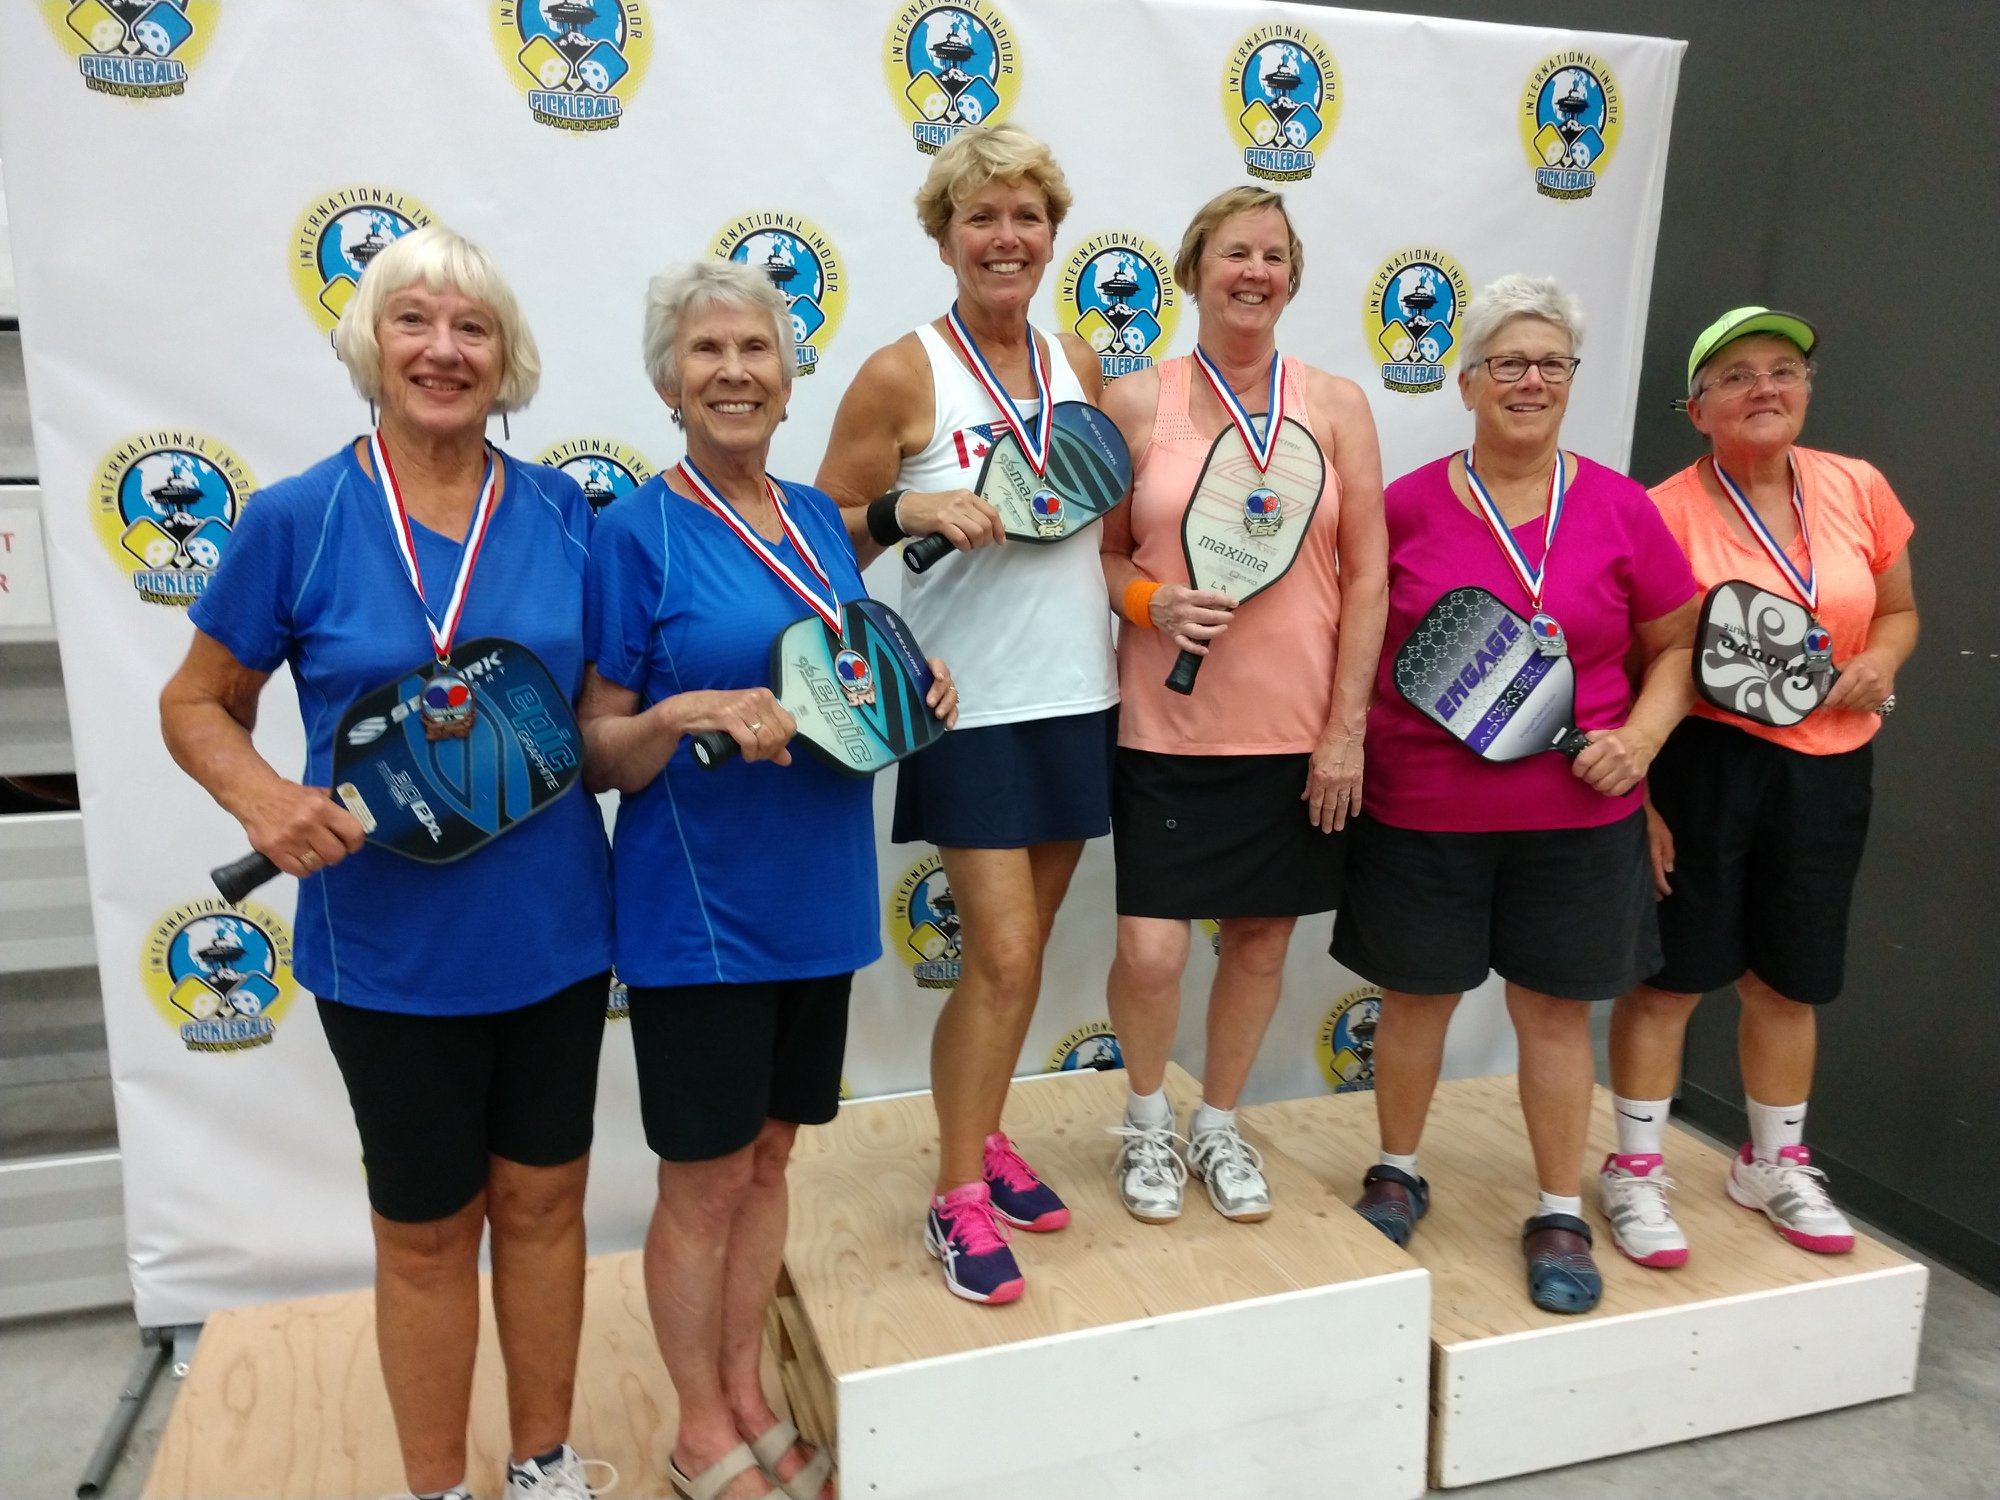 Women's Doubles 4.0 & 4.5: 60+ Jeannie Ramsey/Beverly Hoffman - Bronze